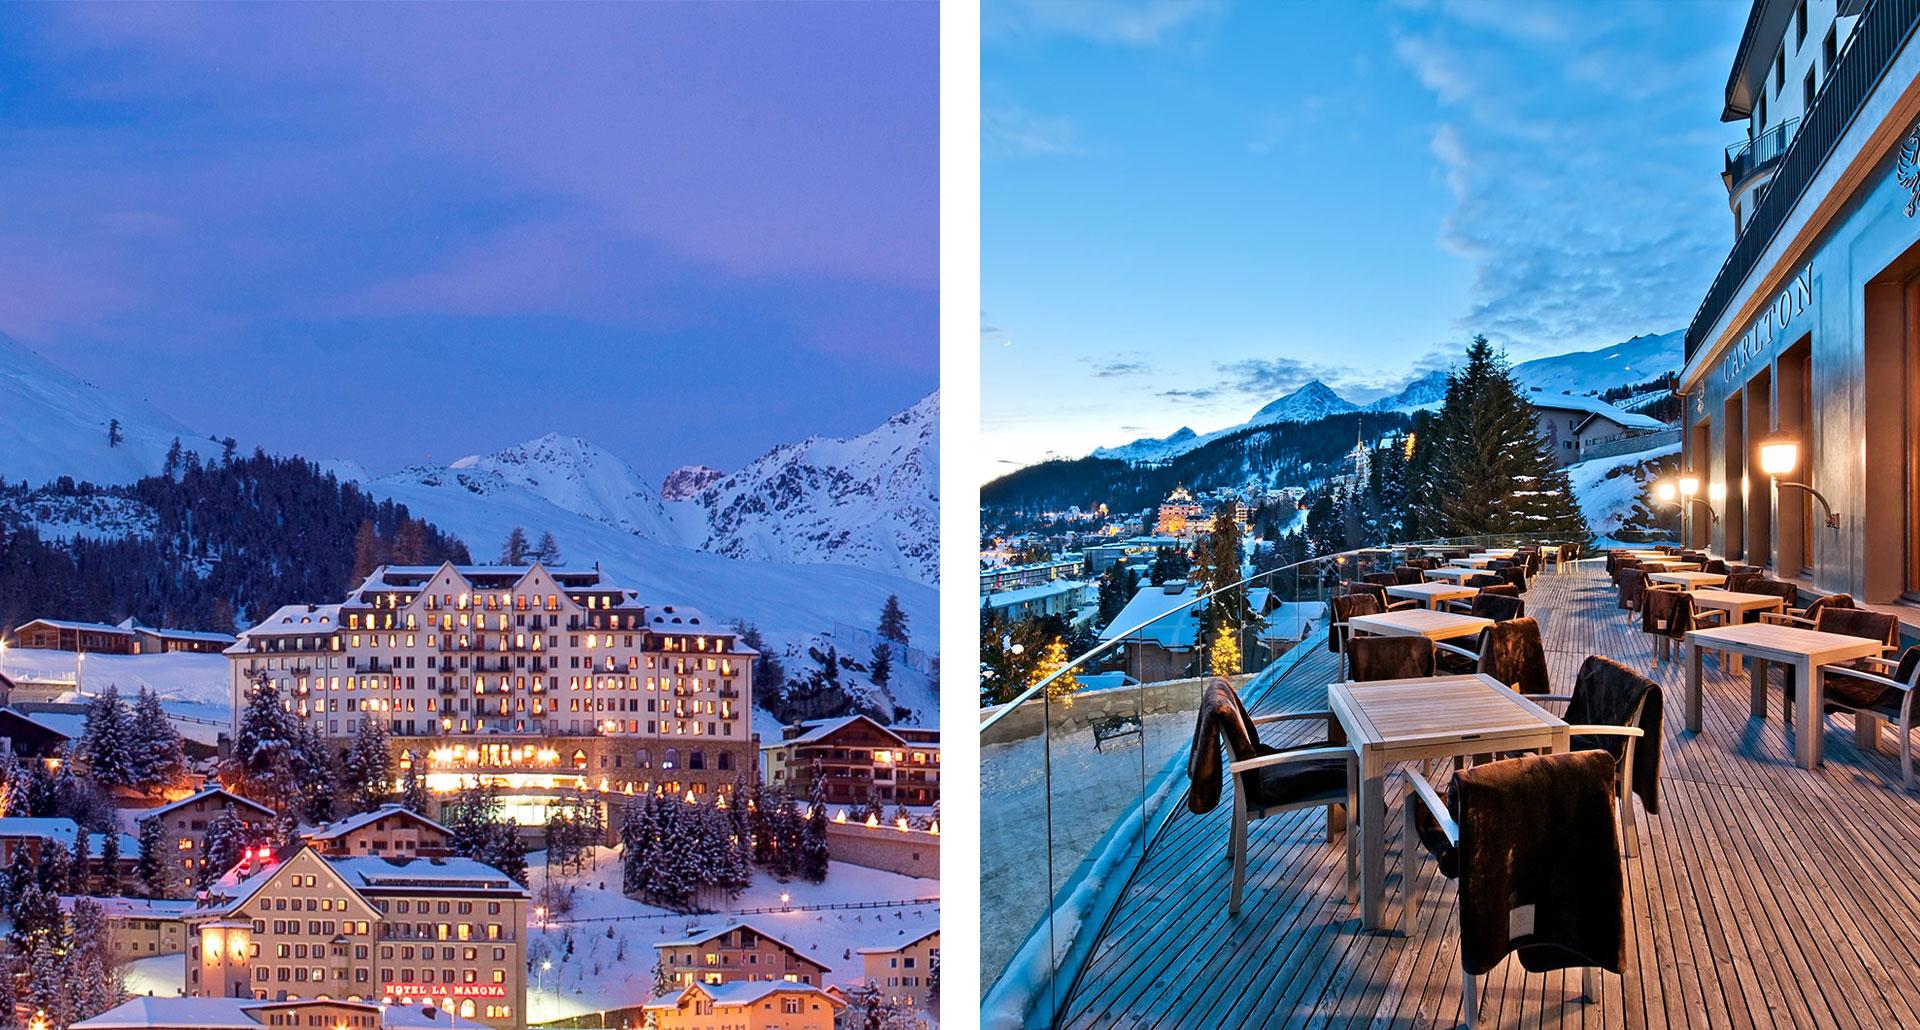 Carlton Hotel St. Moritz - boutique hotel in St Moritz